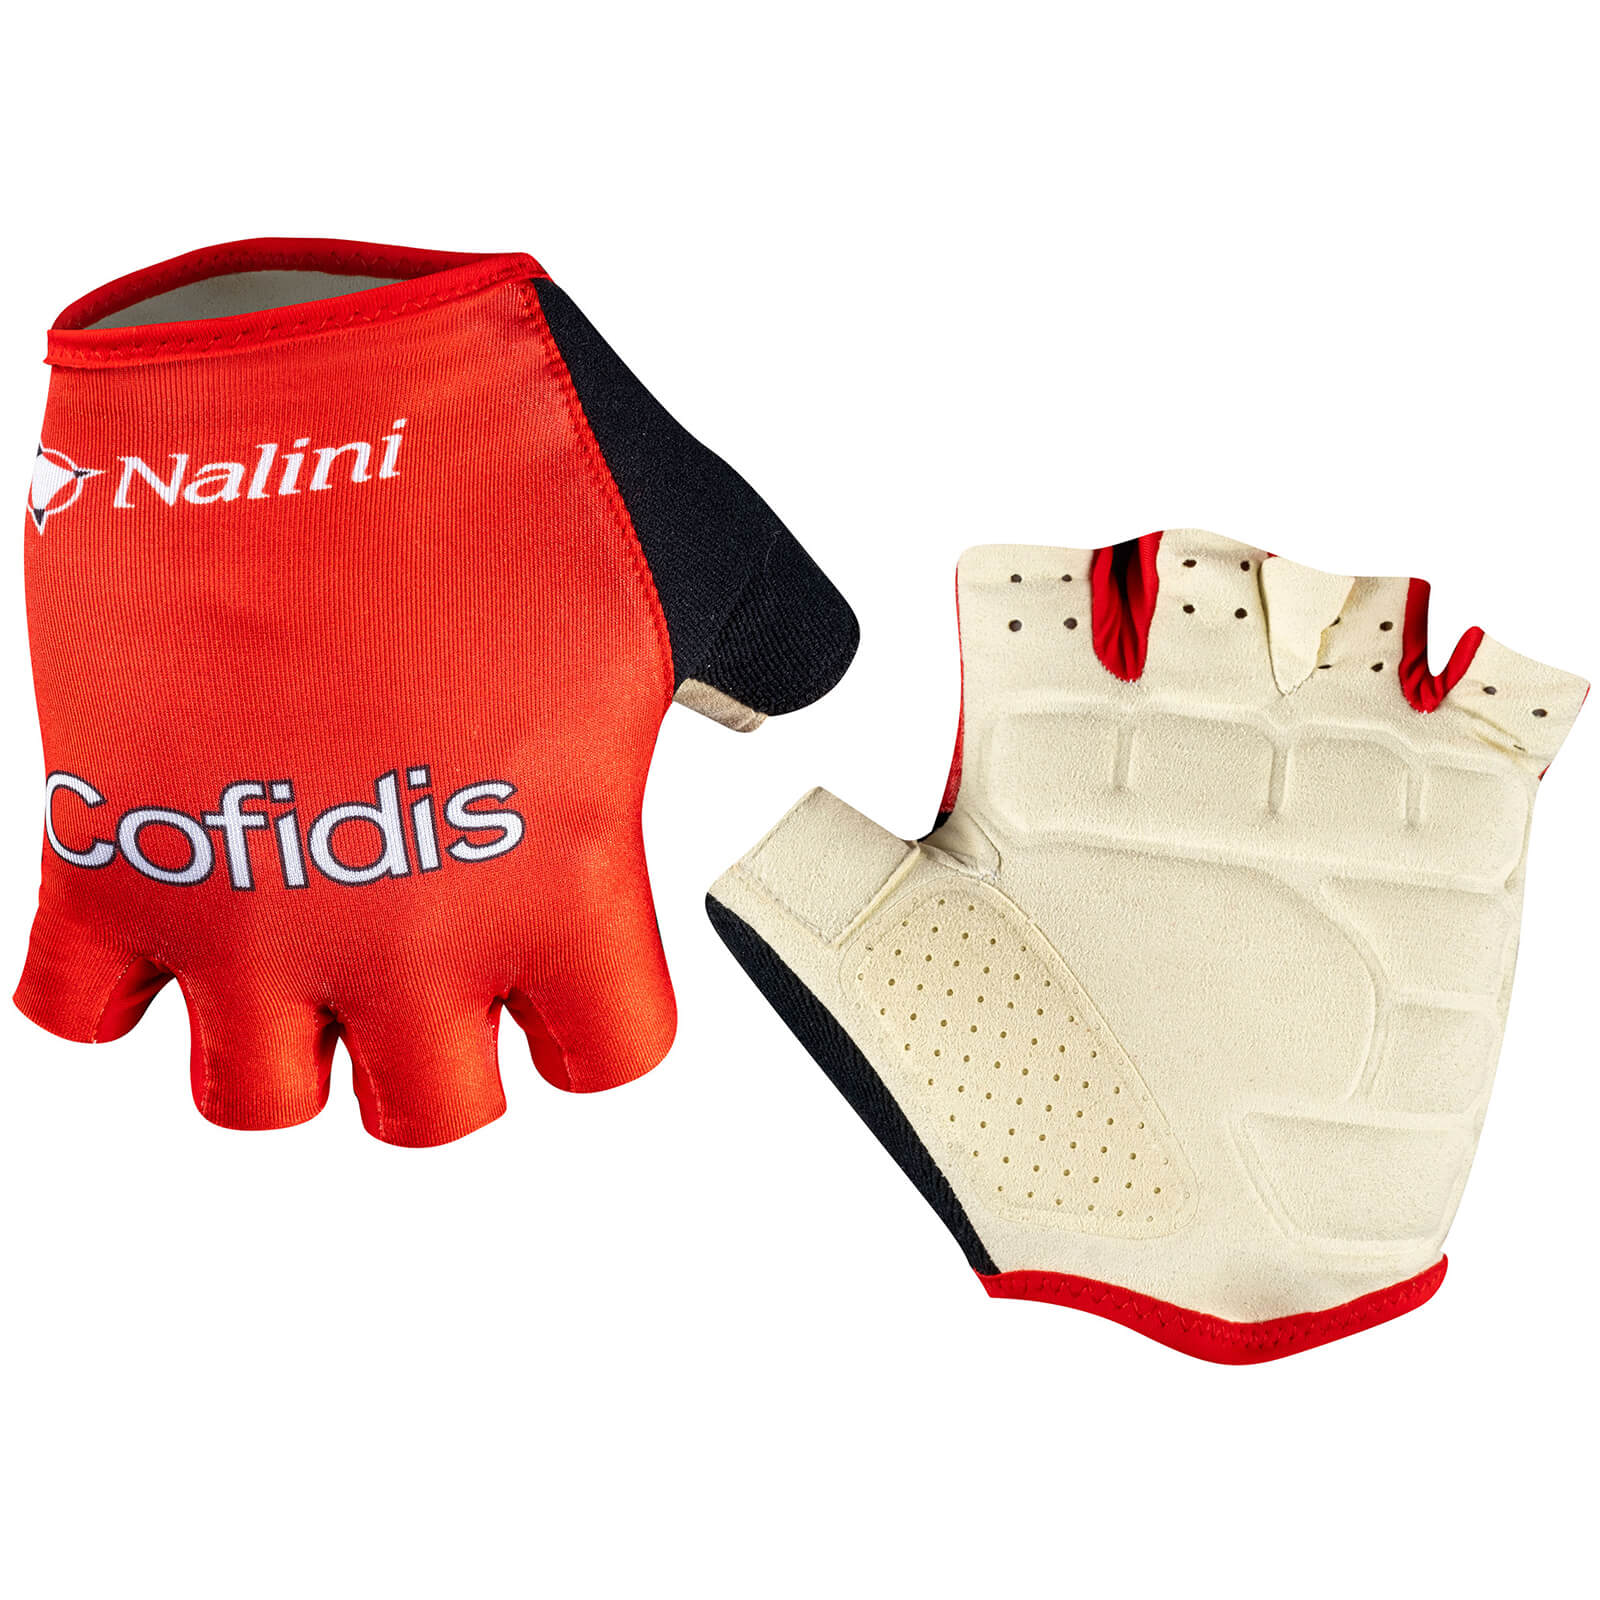 Nalini Cofidis Gloves - S